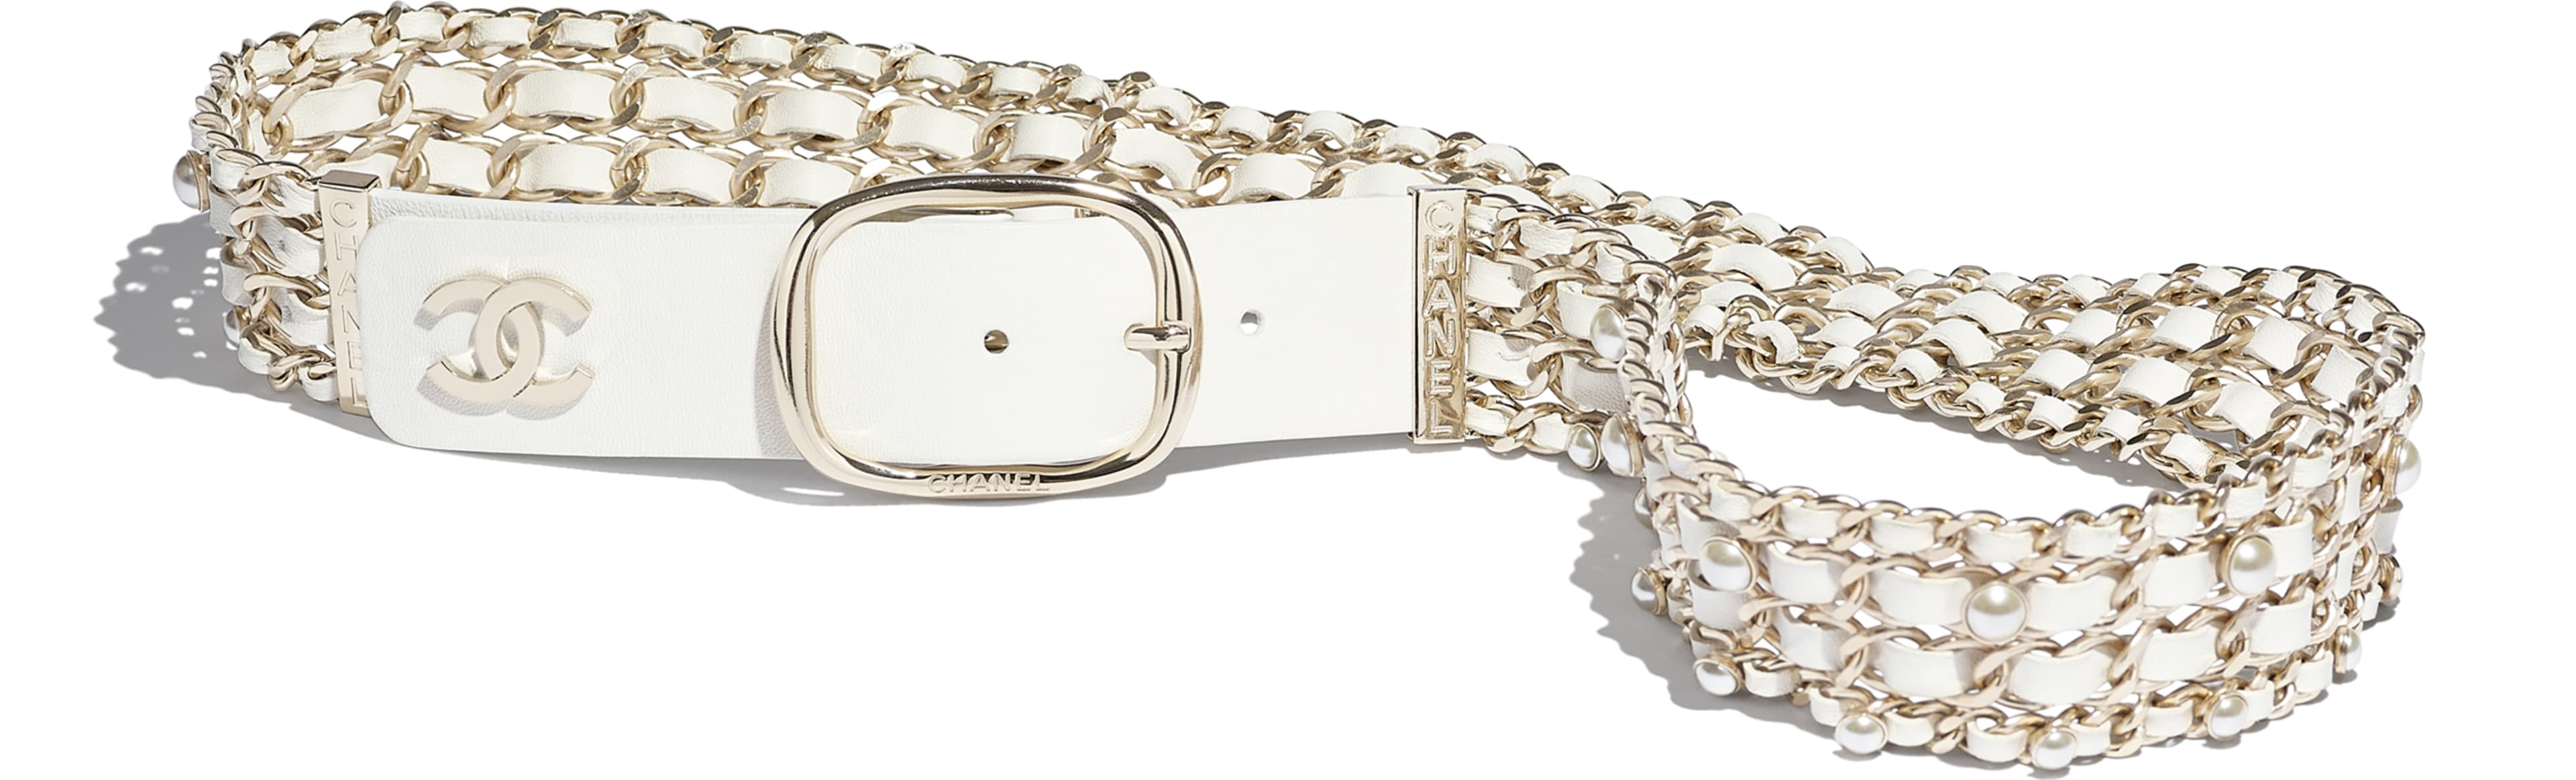 Lambskin, Gold-Tone Metal & Glass Pearls White